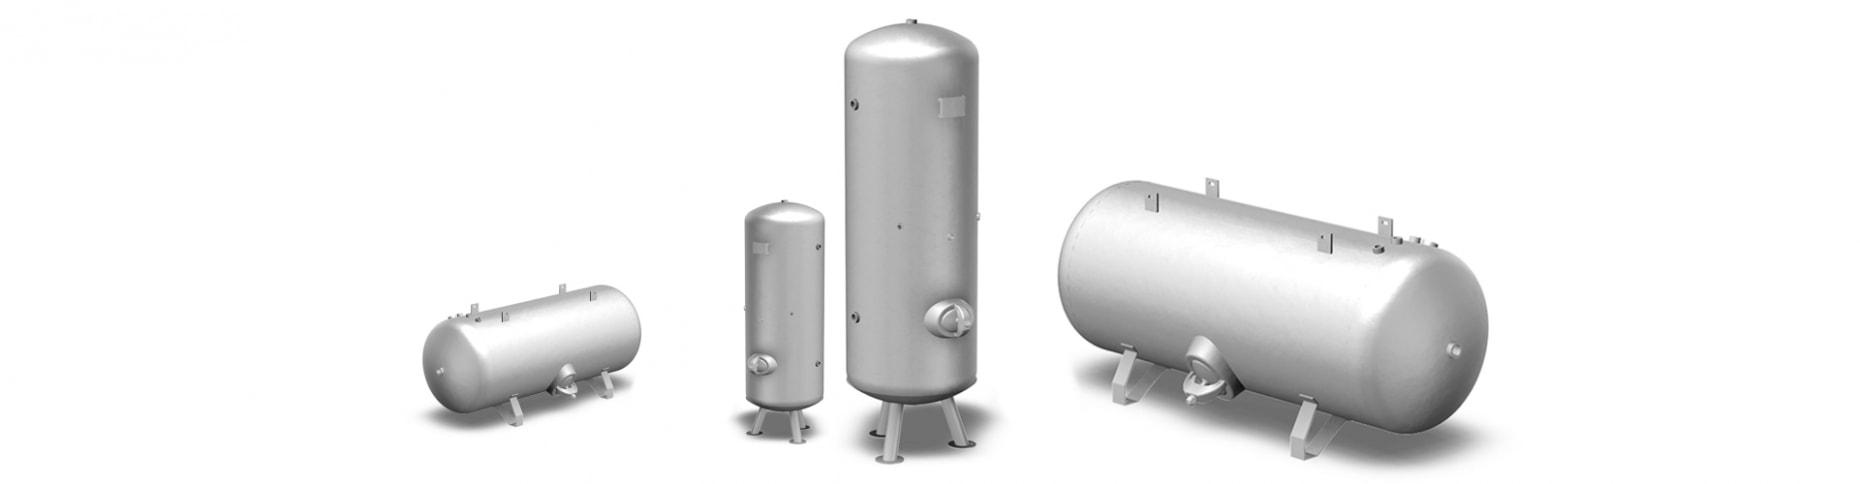 Boos Drucklufttechnik - Sortiment Druckluftbehälter